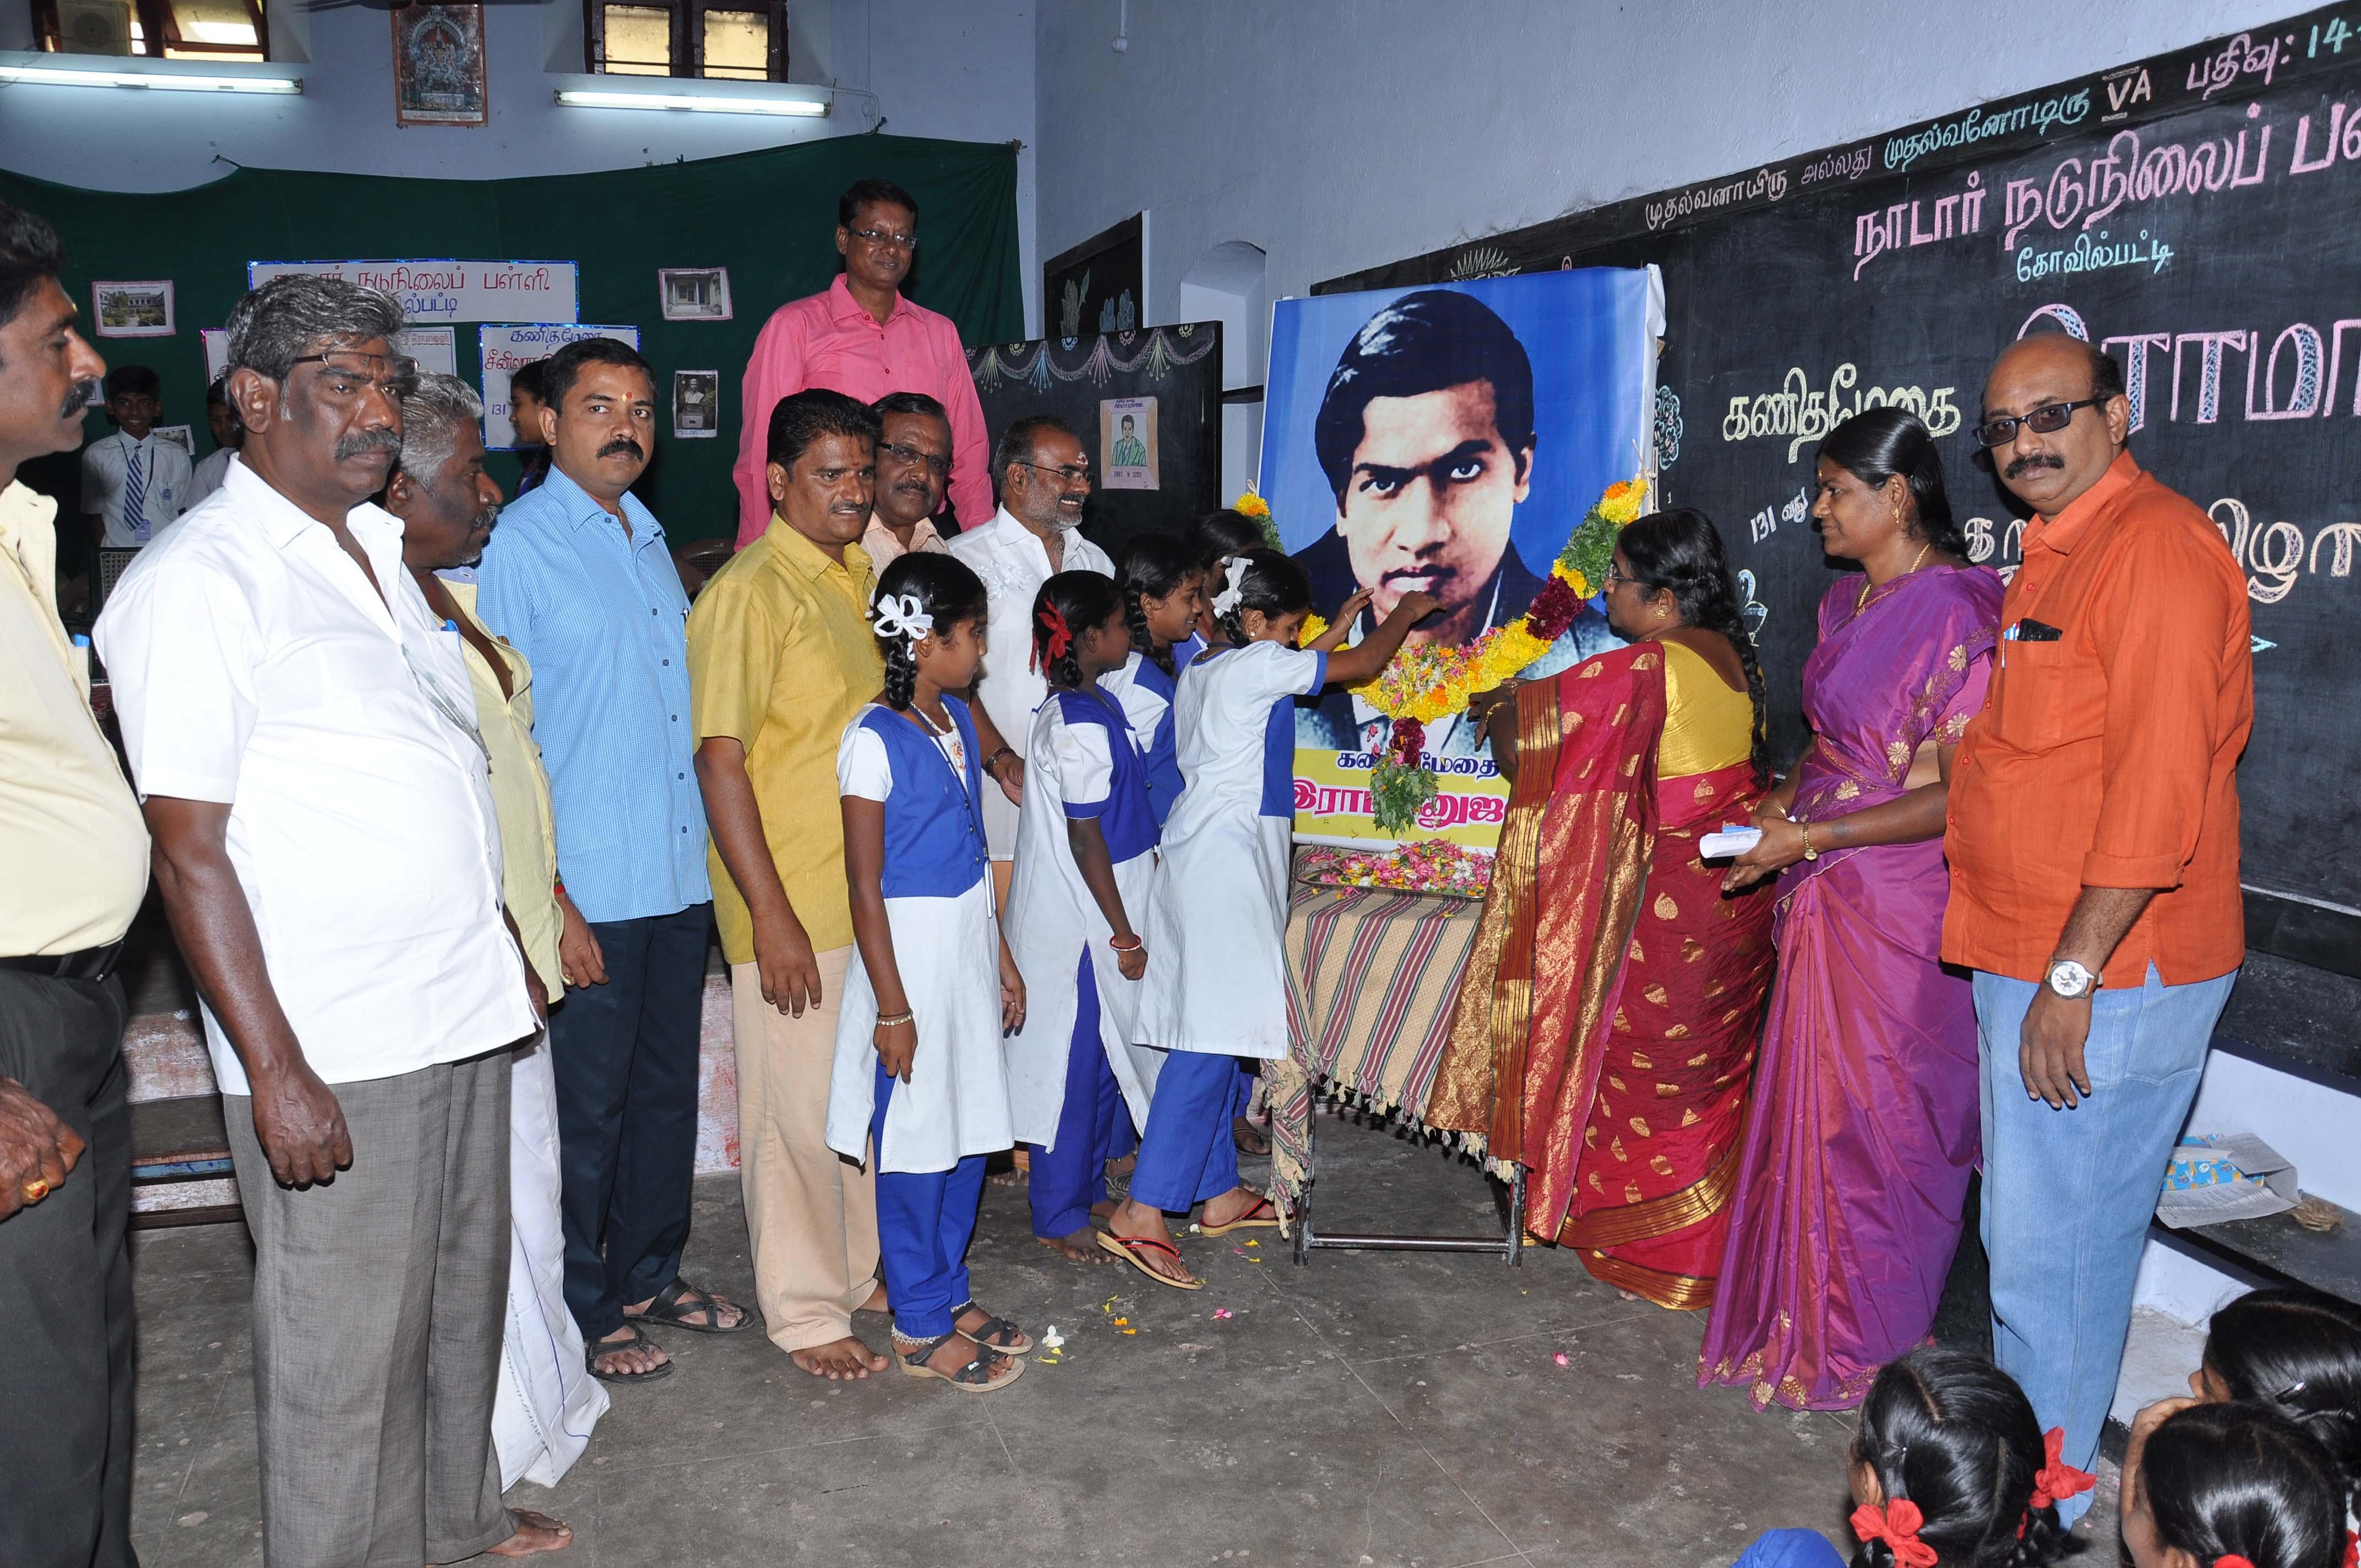 National mathematics day conducted in kovilatti